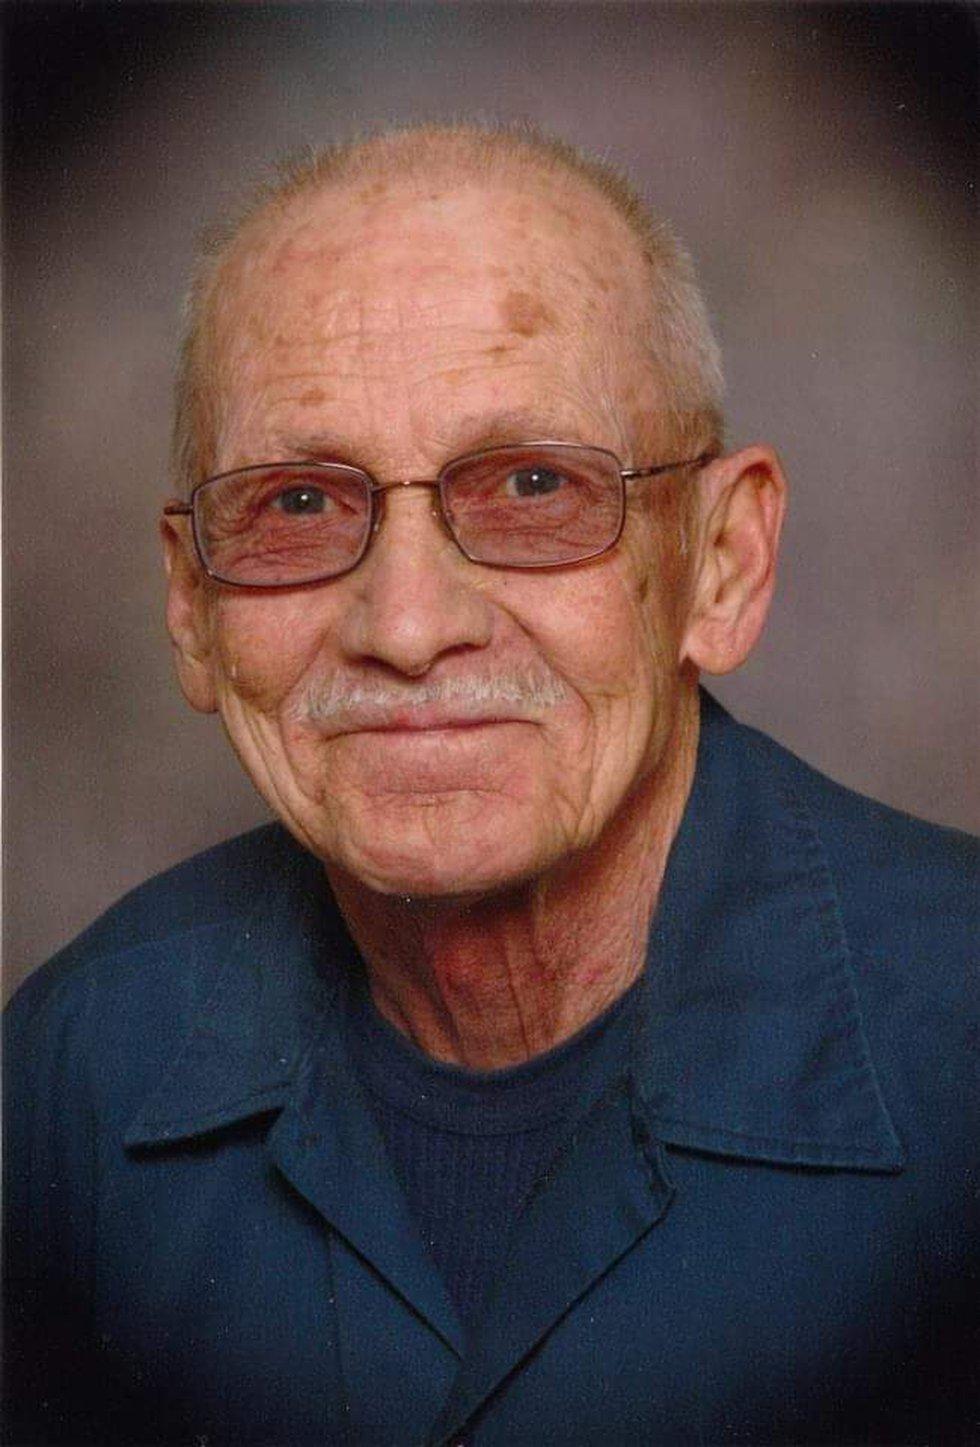 Lawrence J. Jones, 76, of DeKalb Junction, died on January 22, 2020, at his home.